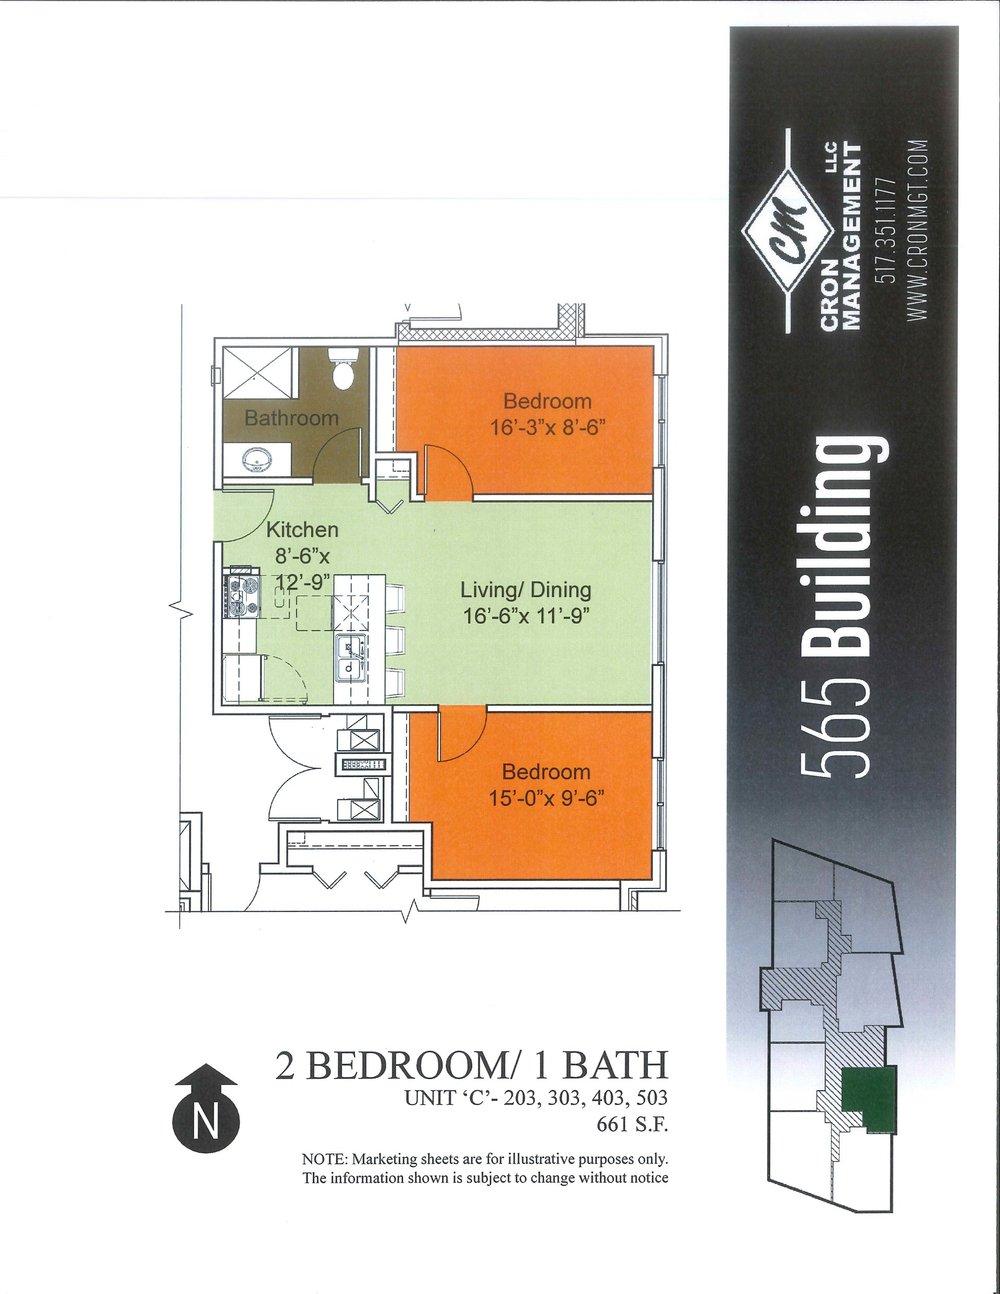 203-503- Two Bedroom, One Bath